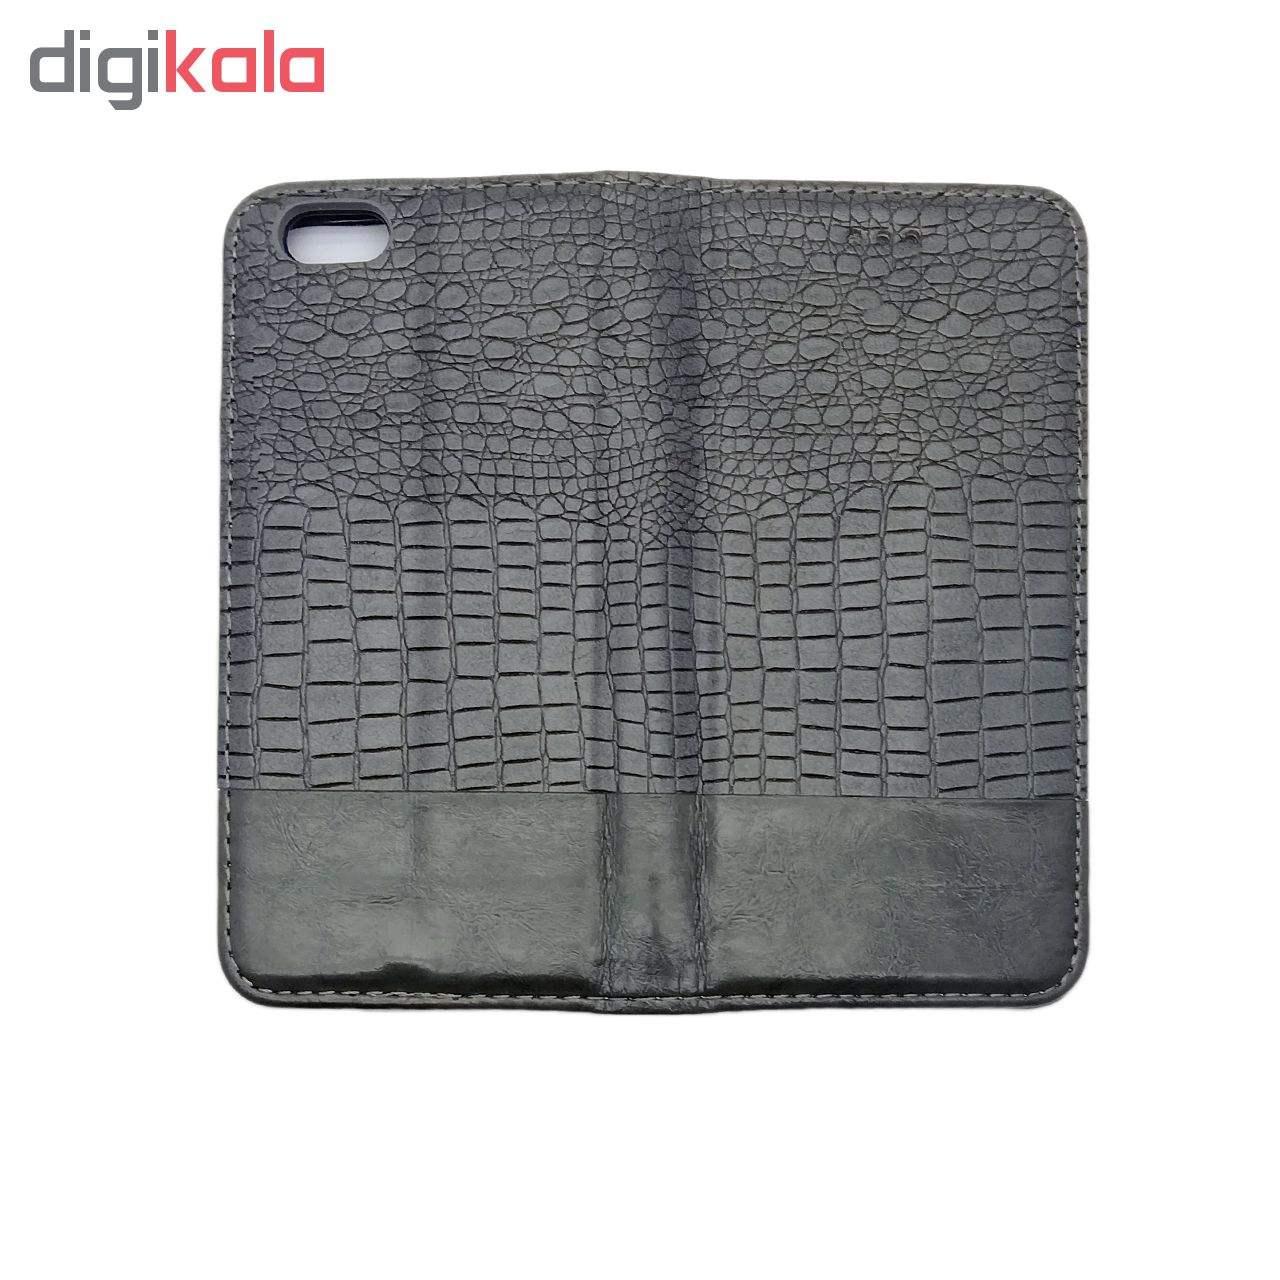 کیف کلاسوری مدل A2 مناسب برای گوشی موبایل اپل iphone 7/8 main 1 3